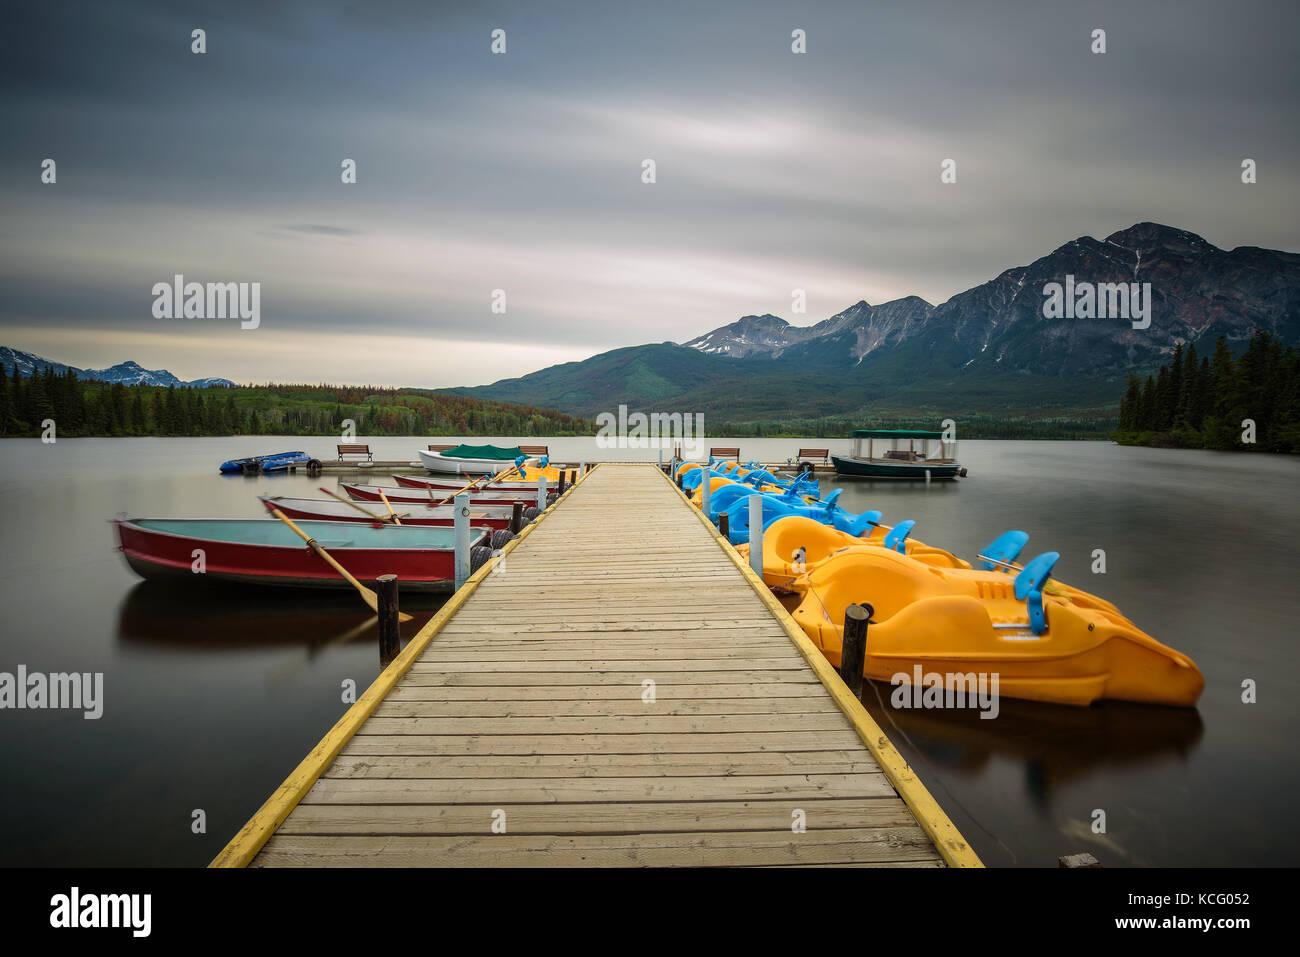 Boote auf einem Steg am Pyramid Lake, Jasper National Park, Kanada Stockbild